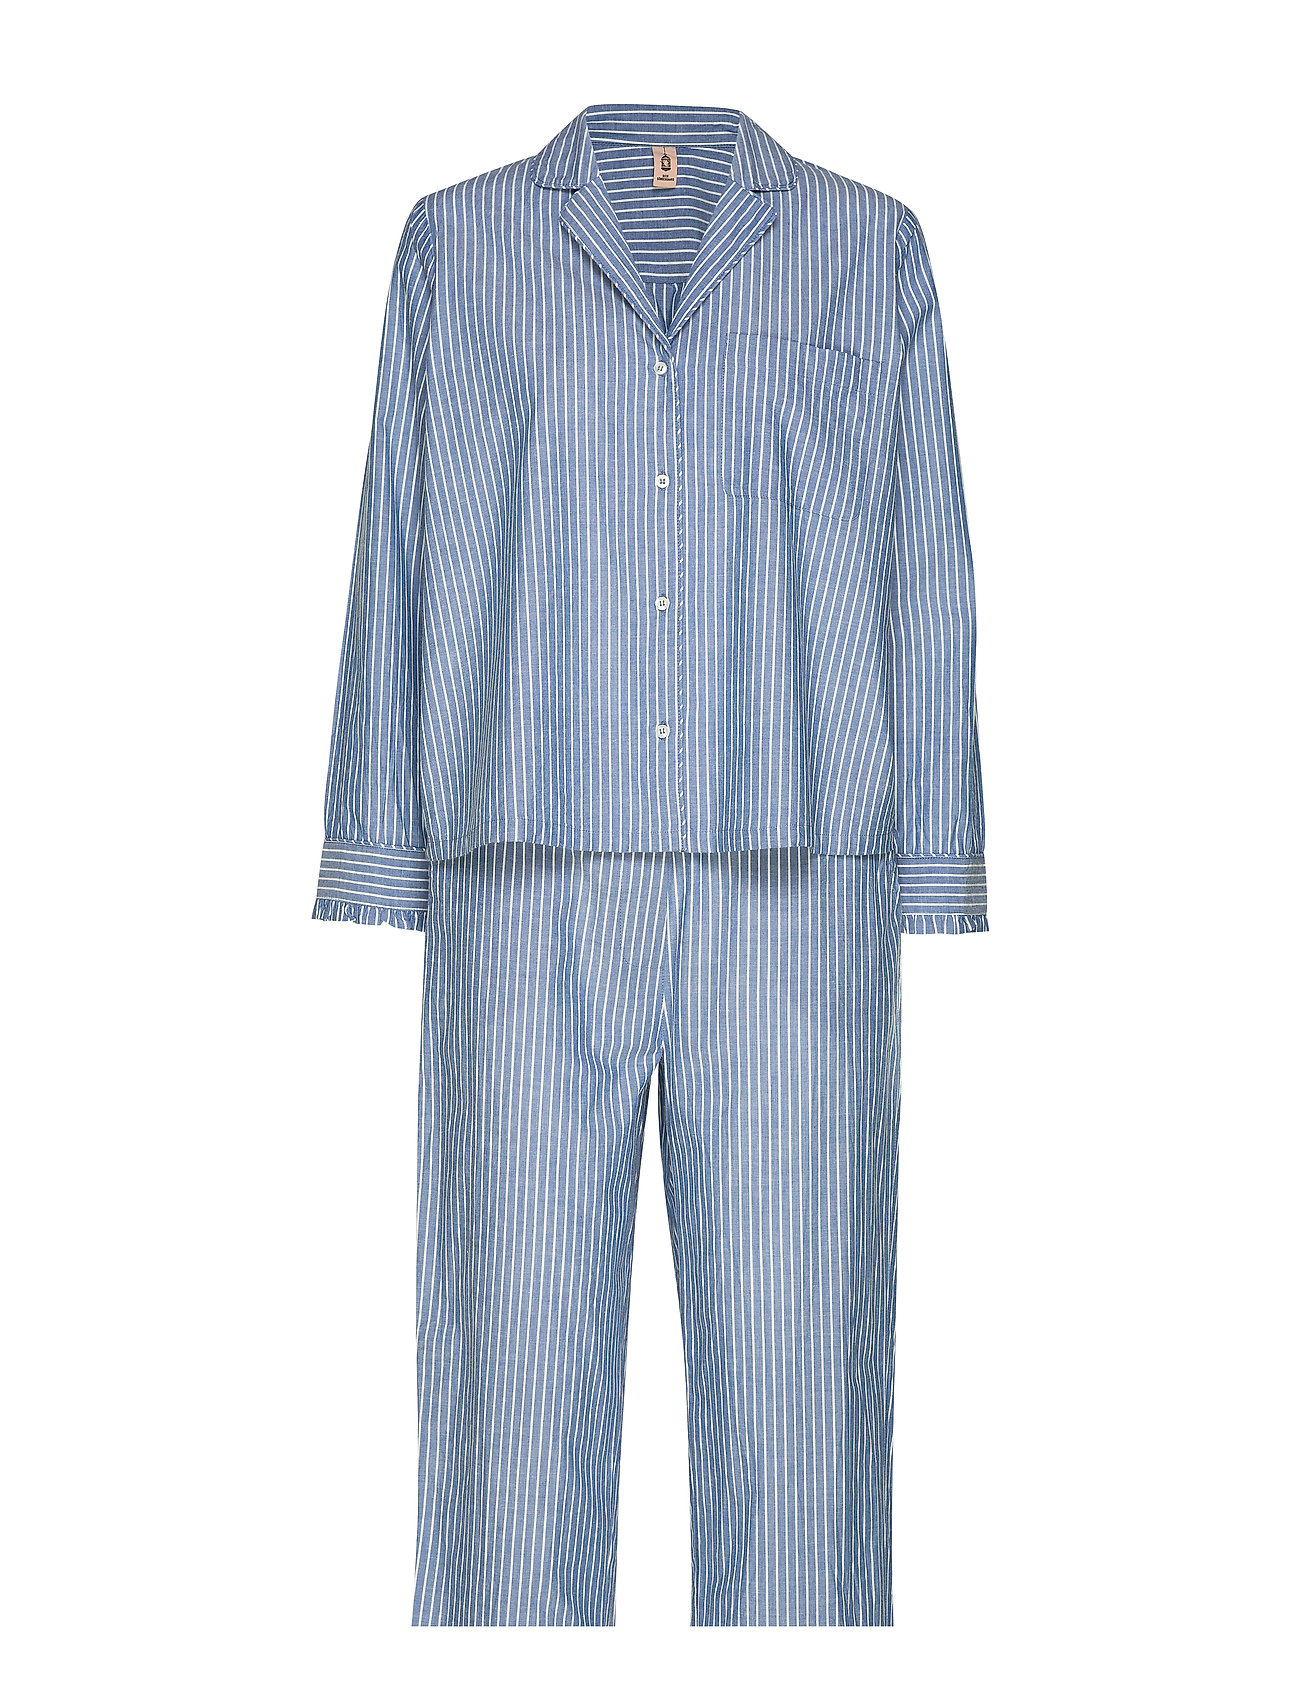 BECKSÖNDERGAARD Pyjamas Giftset - LIGHT BLUE